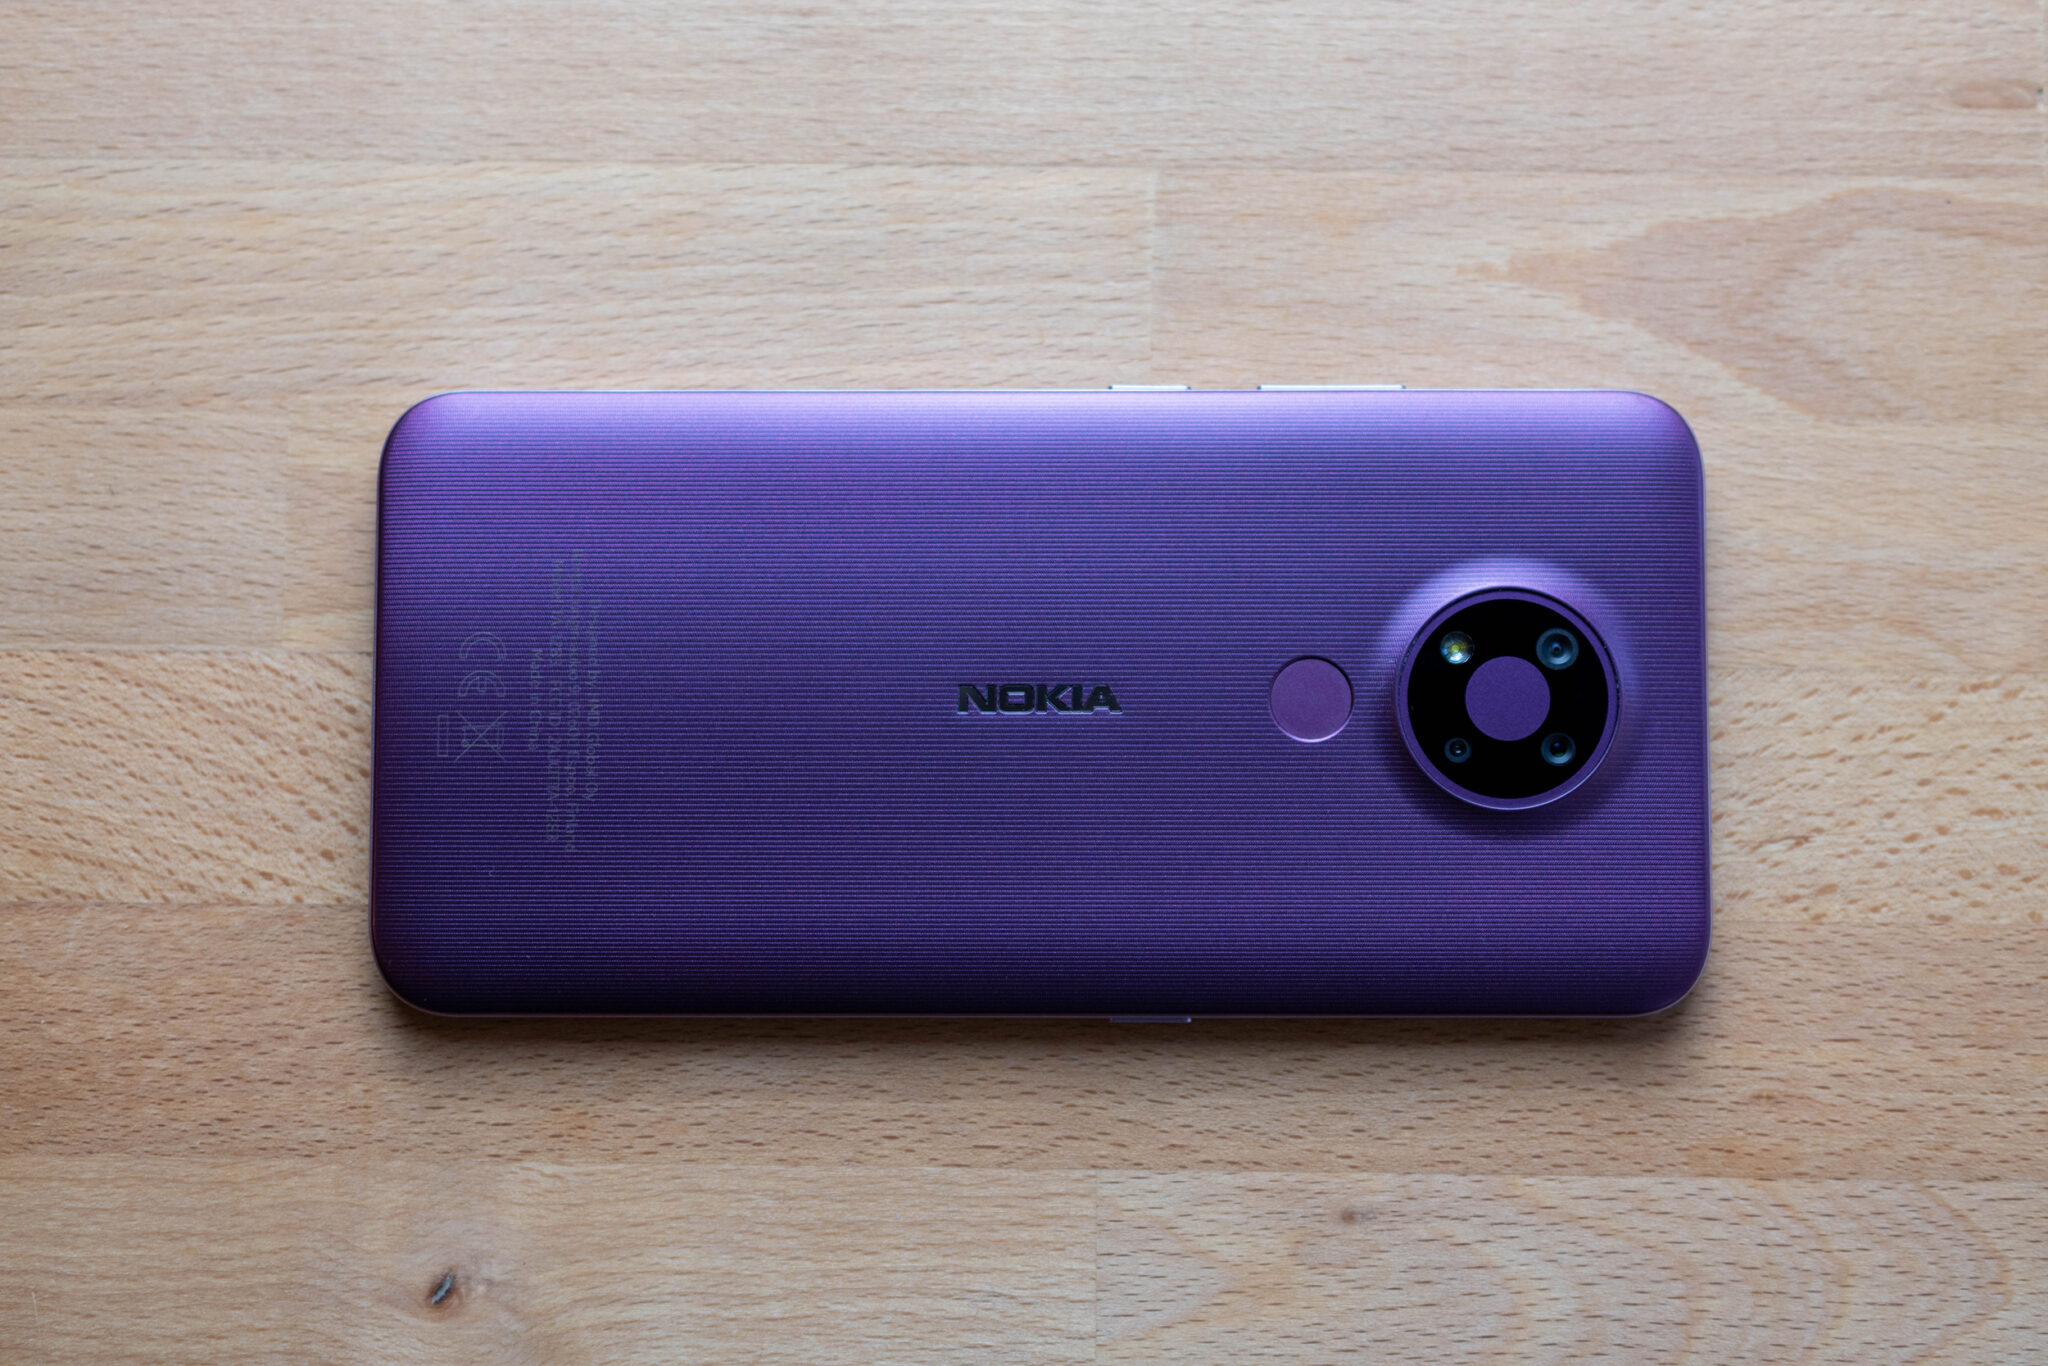 nokia3.4 smartphone im test